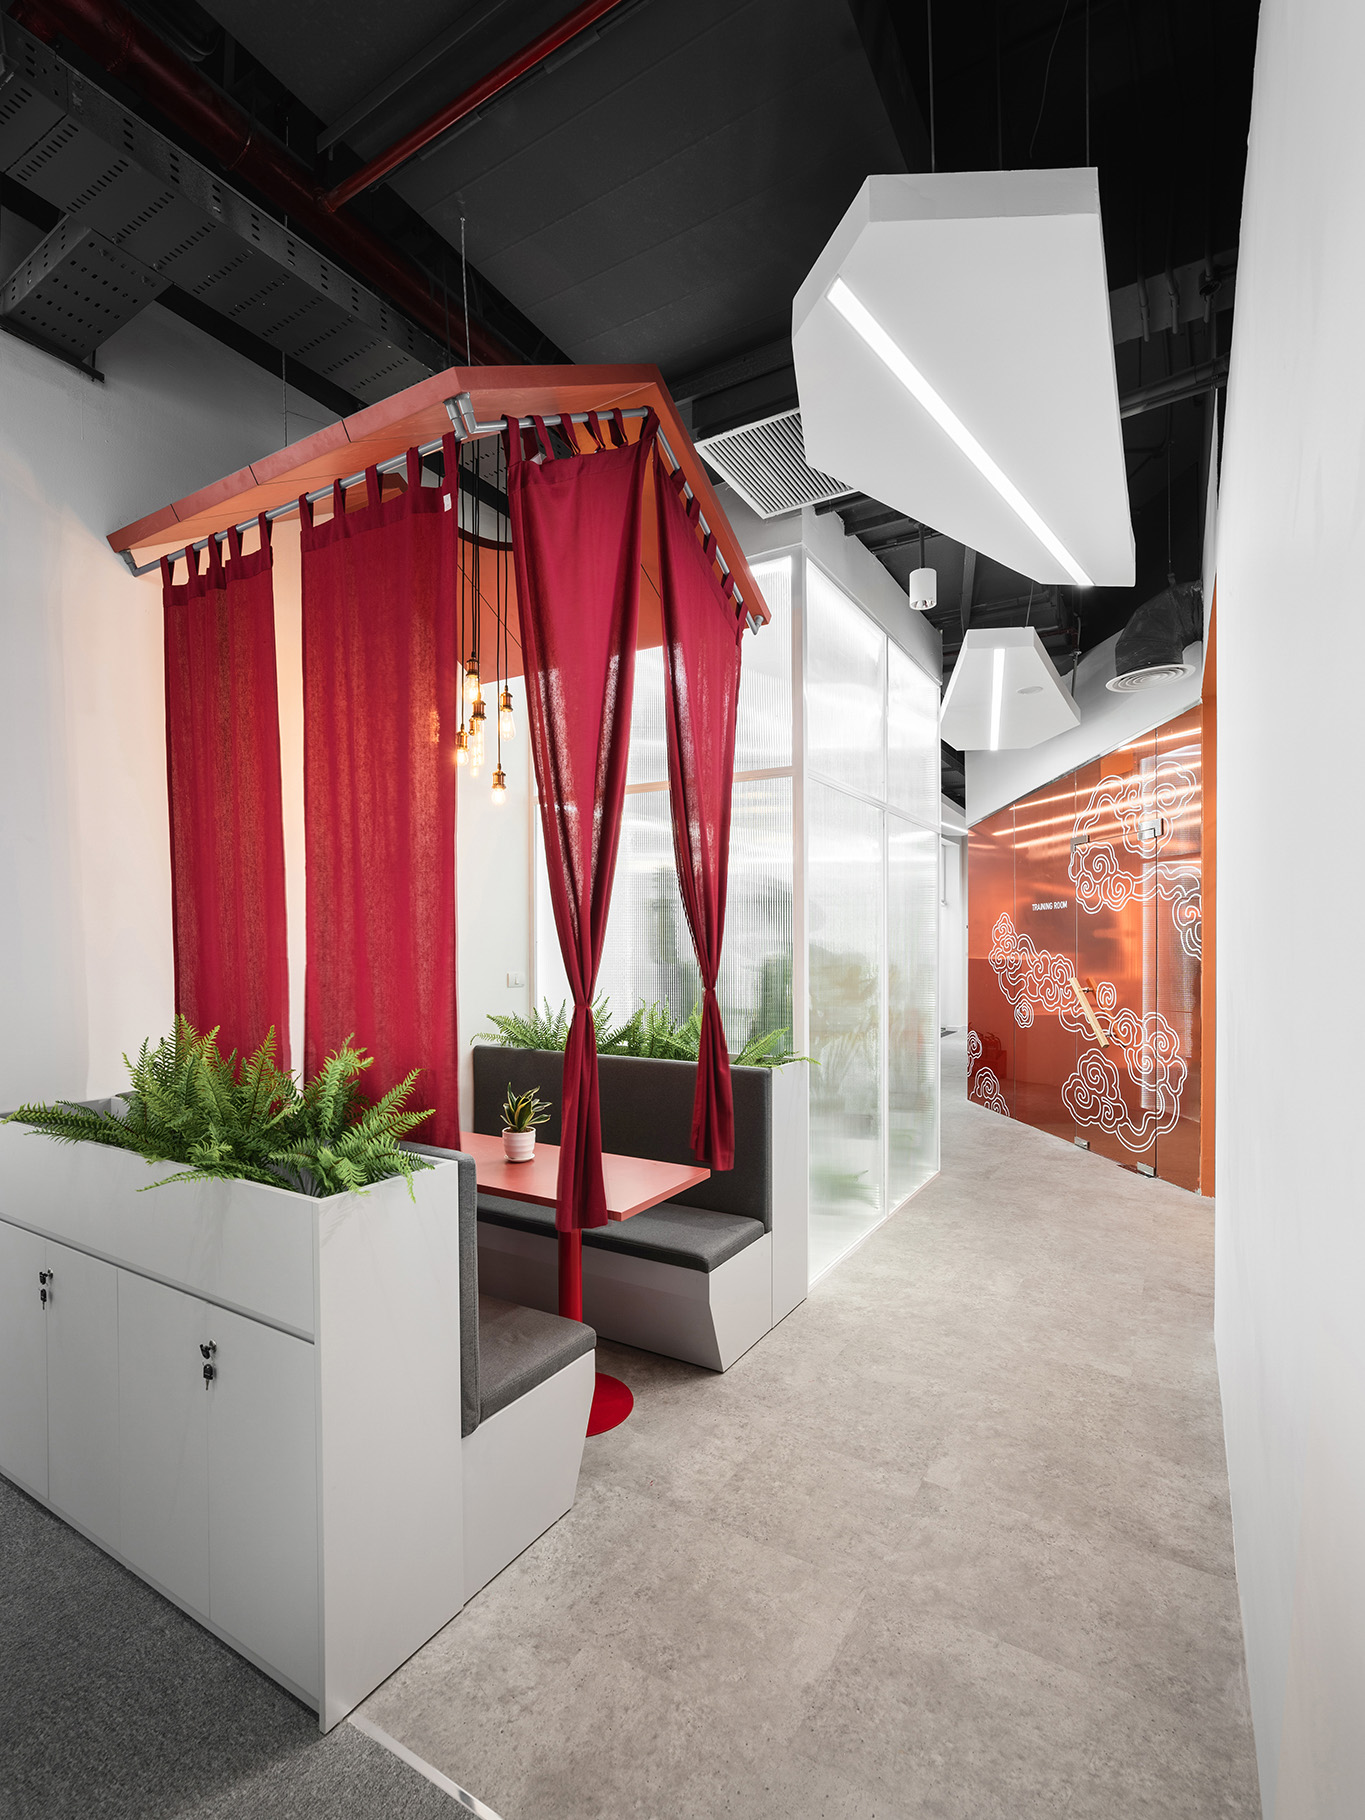 Meeting booth dự án HighCommerce